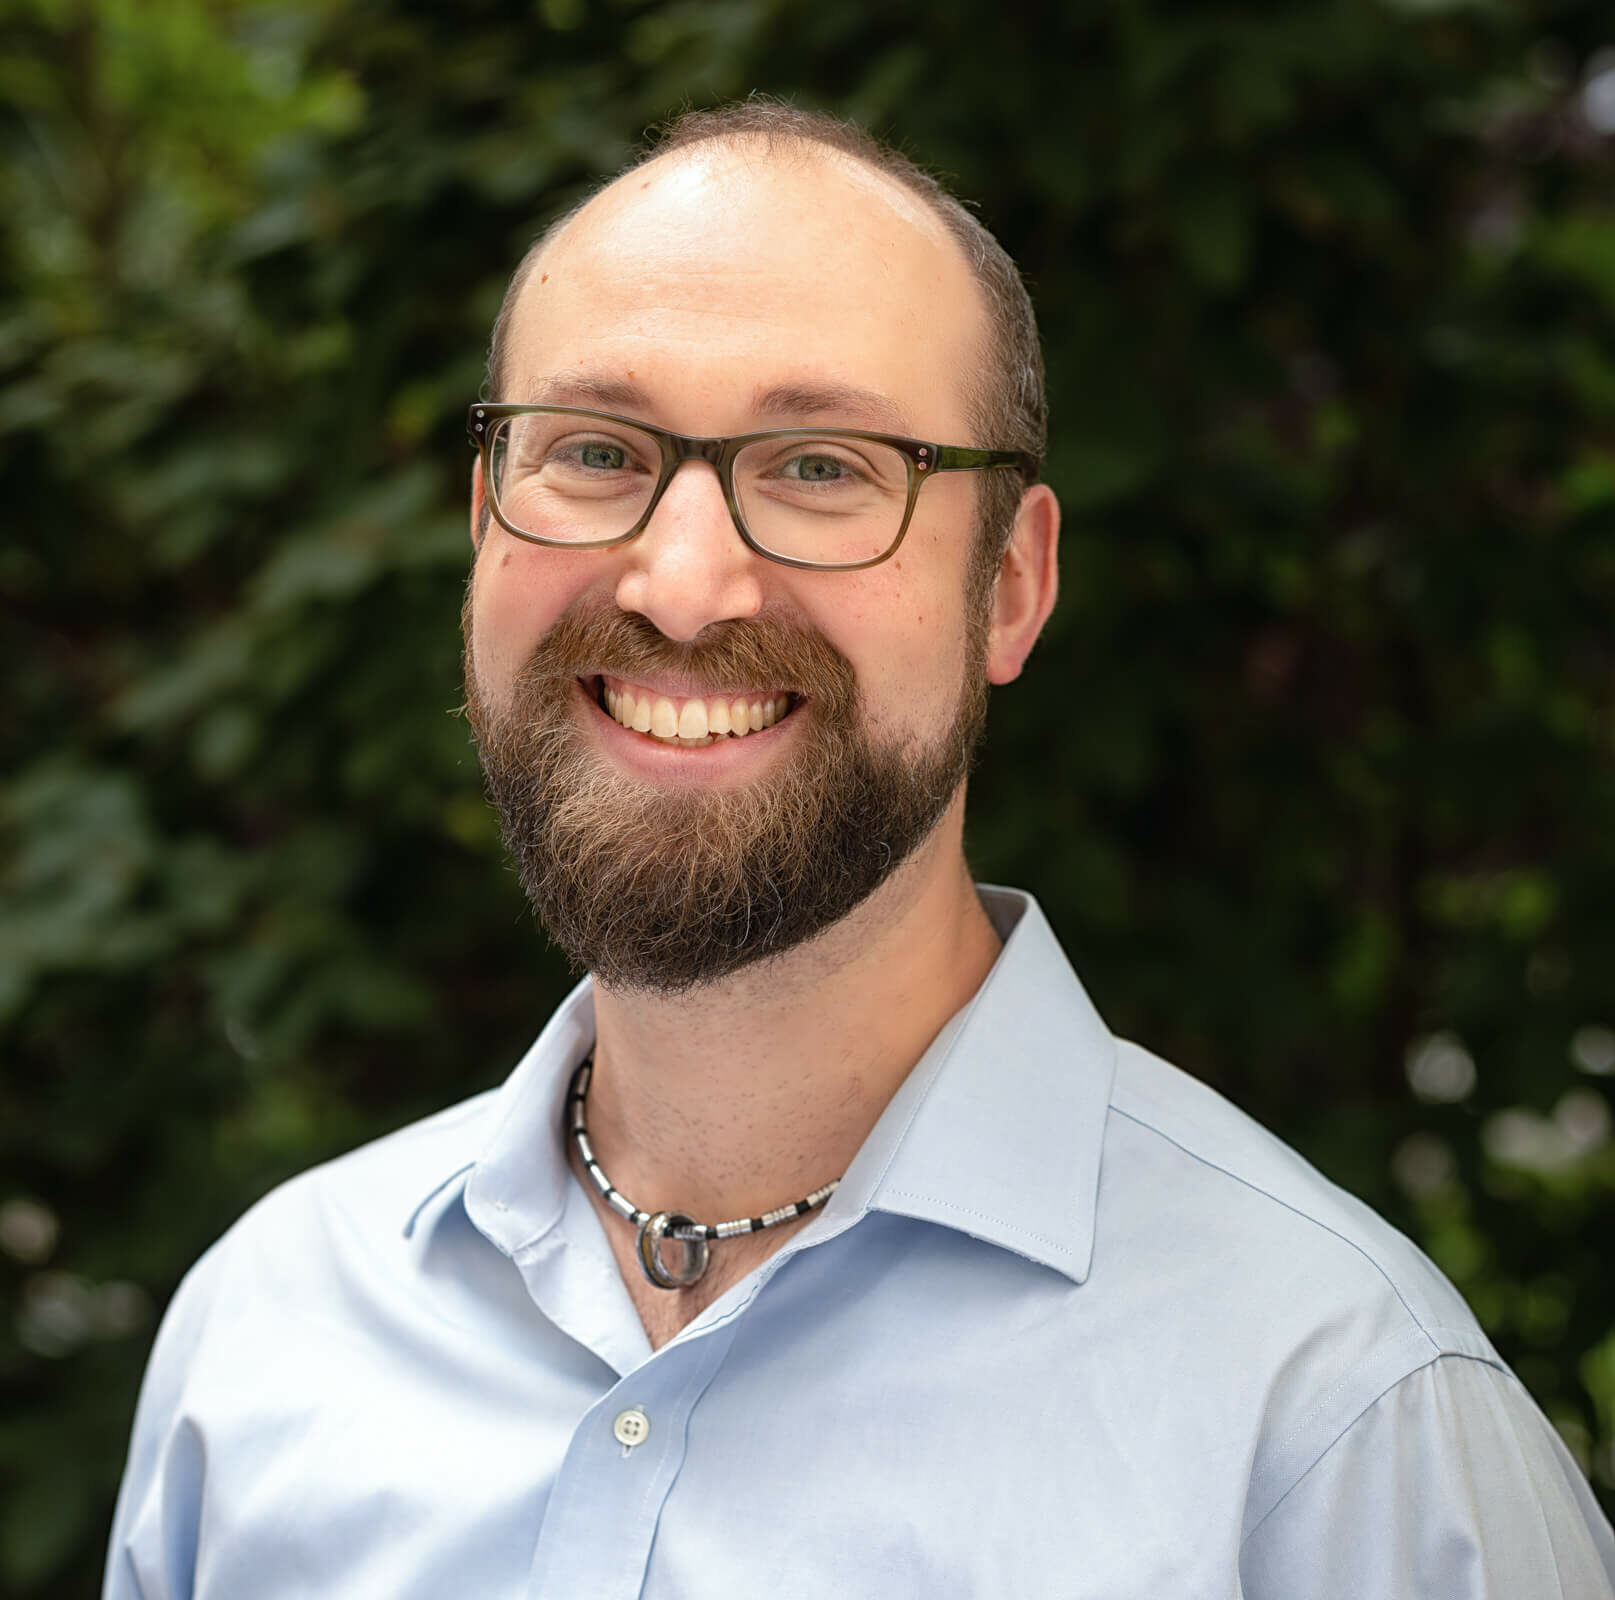 Noah Wilson, staff member at Mountain BizWorks